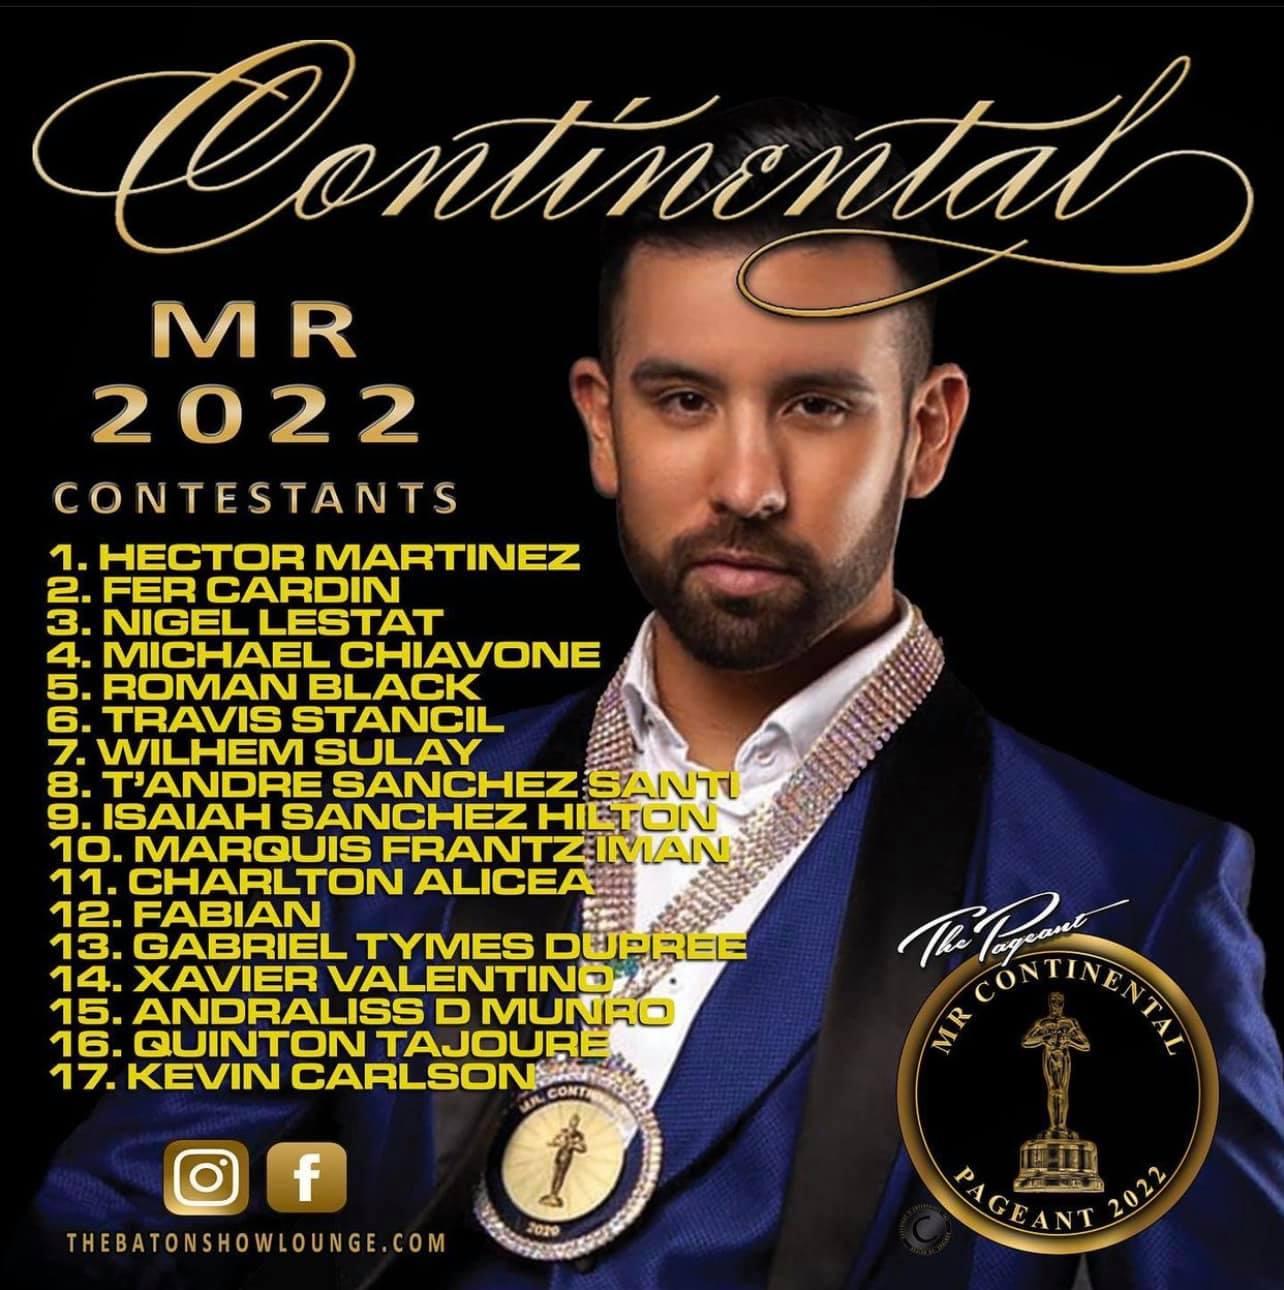 Mr. Continental 2022 Contestants